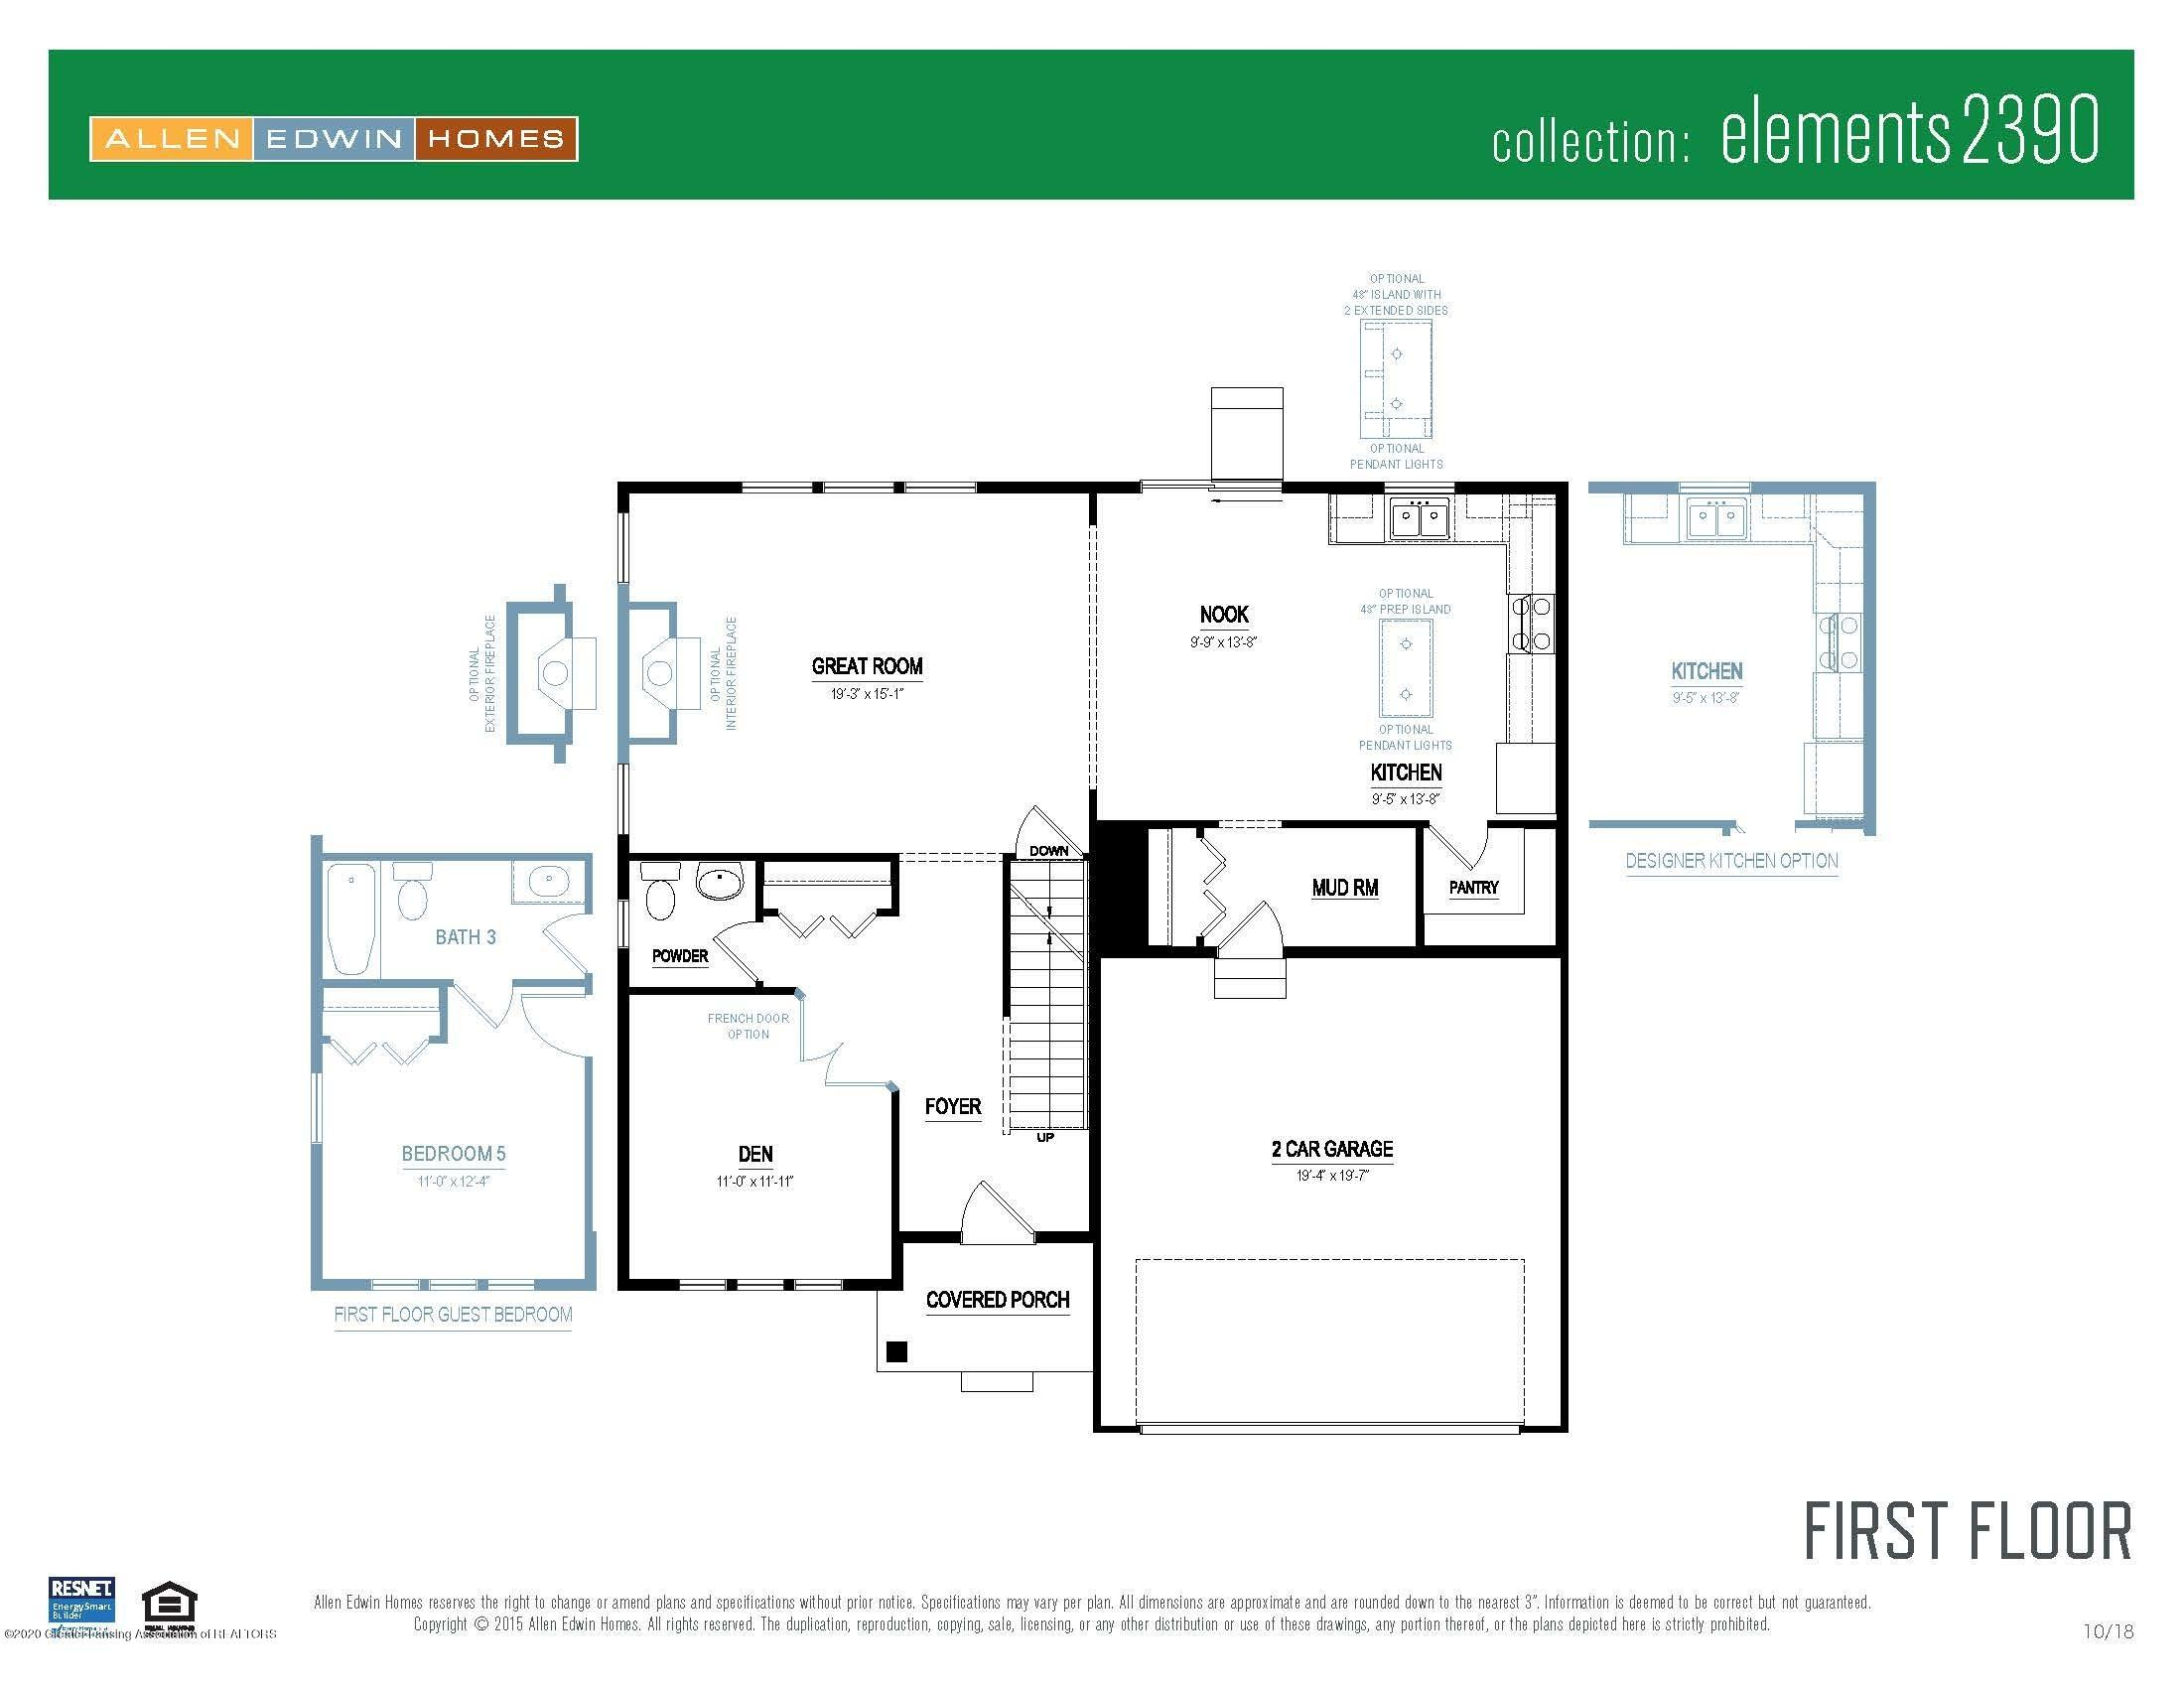 6463 Savanna Way - Elements 2390 V8.0a First Floor - 5